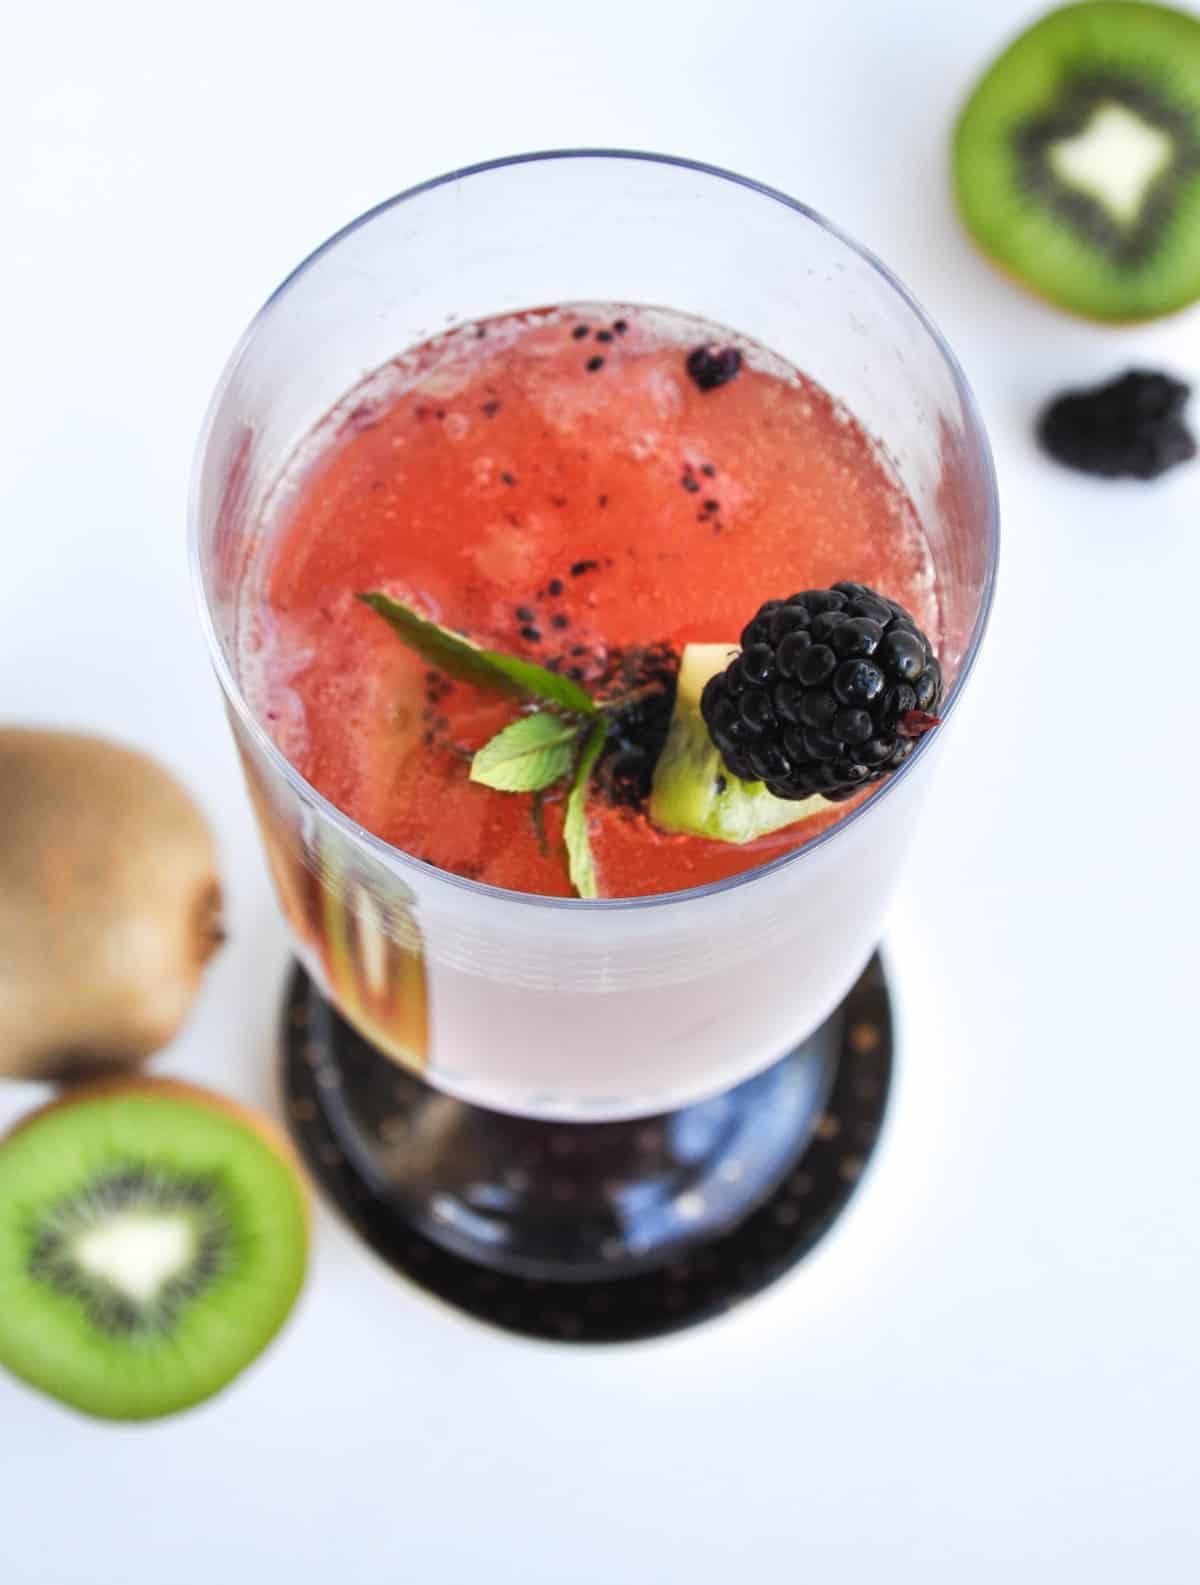 Blackberry Kiwi Mimosa with blackberry, kiwi skewer as garnish